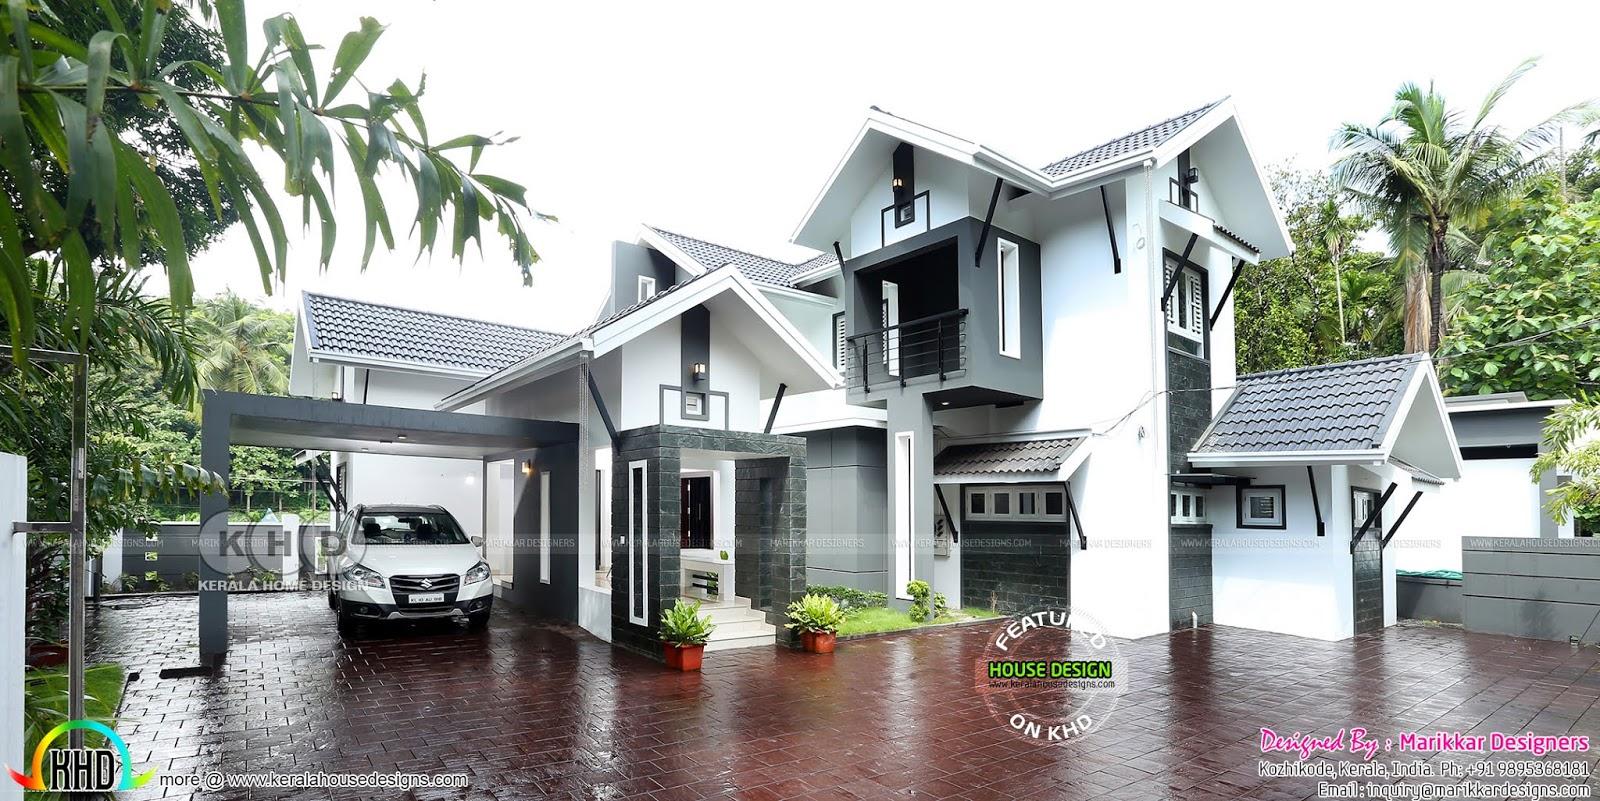 Furnished Interior And Exterior Of 4 Bedroom House Kerala Home Design Bloglovin